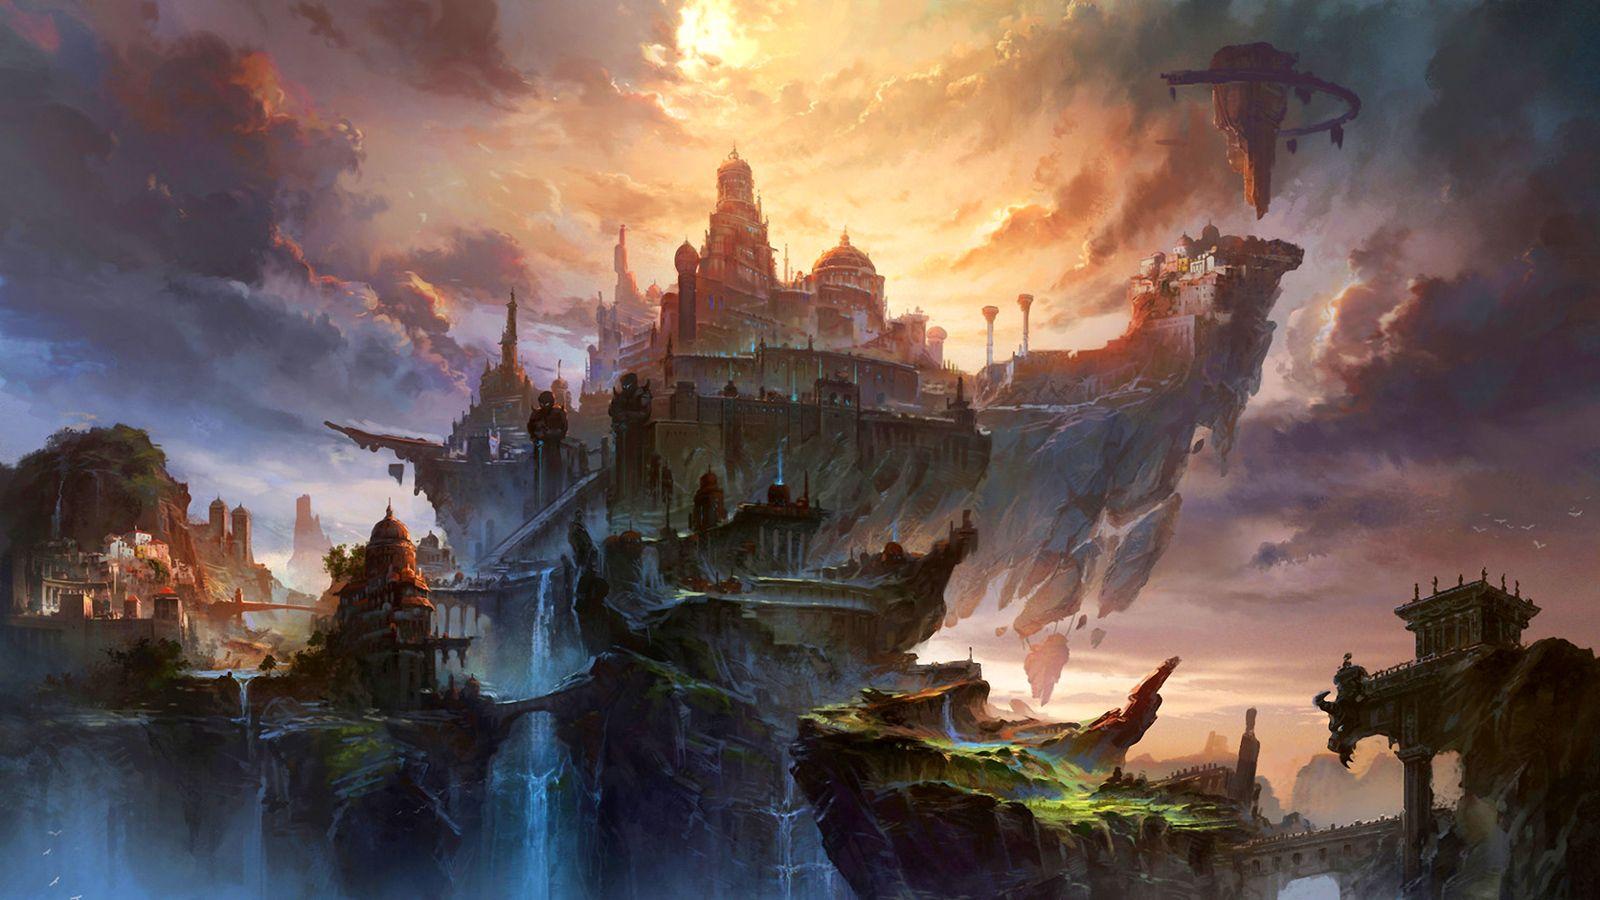 Fantasy City Concept Art Cloud Wallpaper Ma Shang Xuan Hu X1 Mouse Professional Gaming